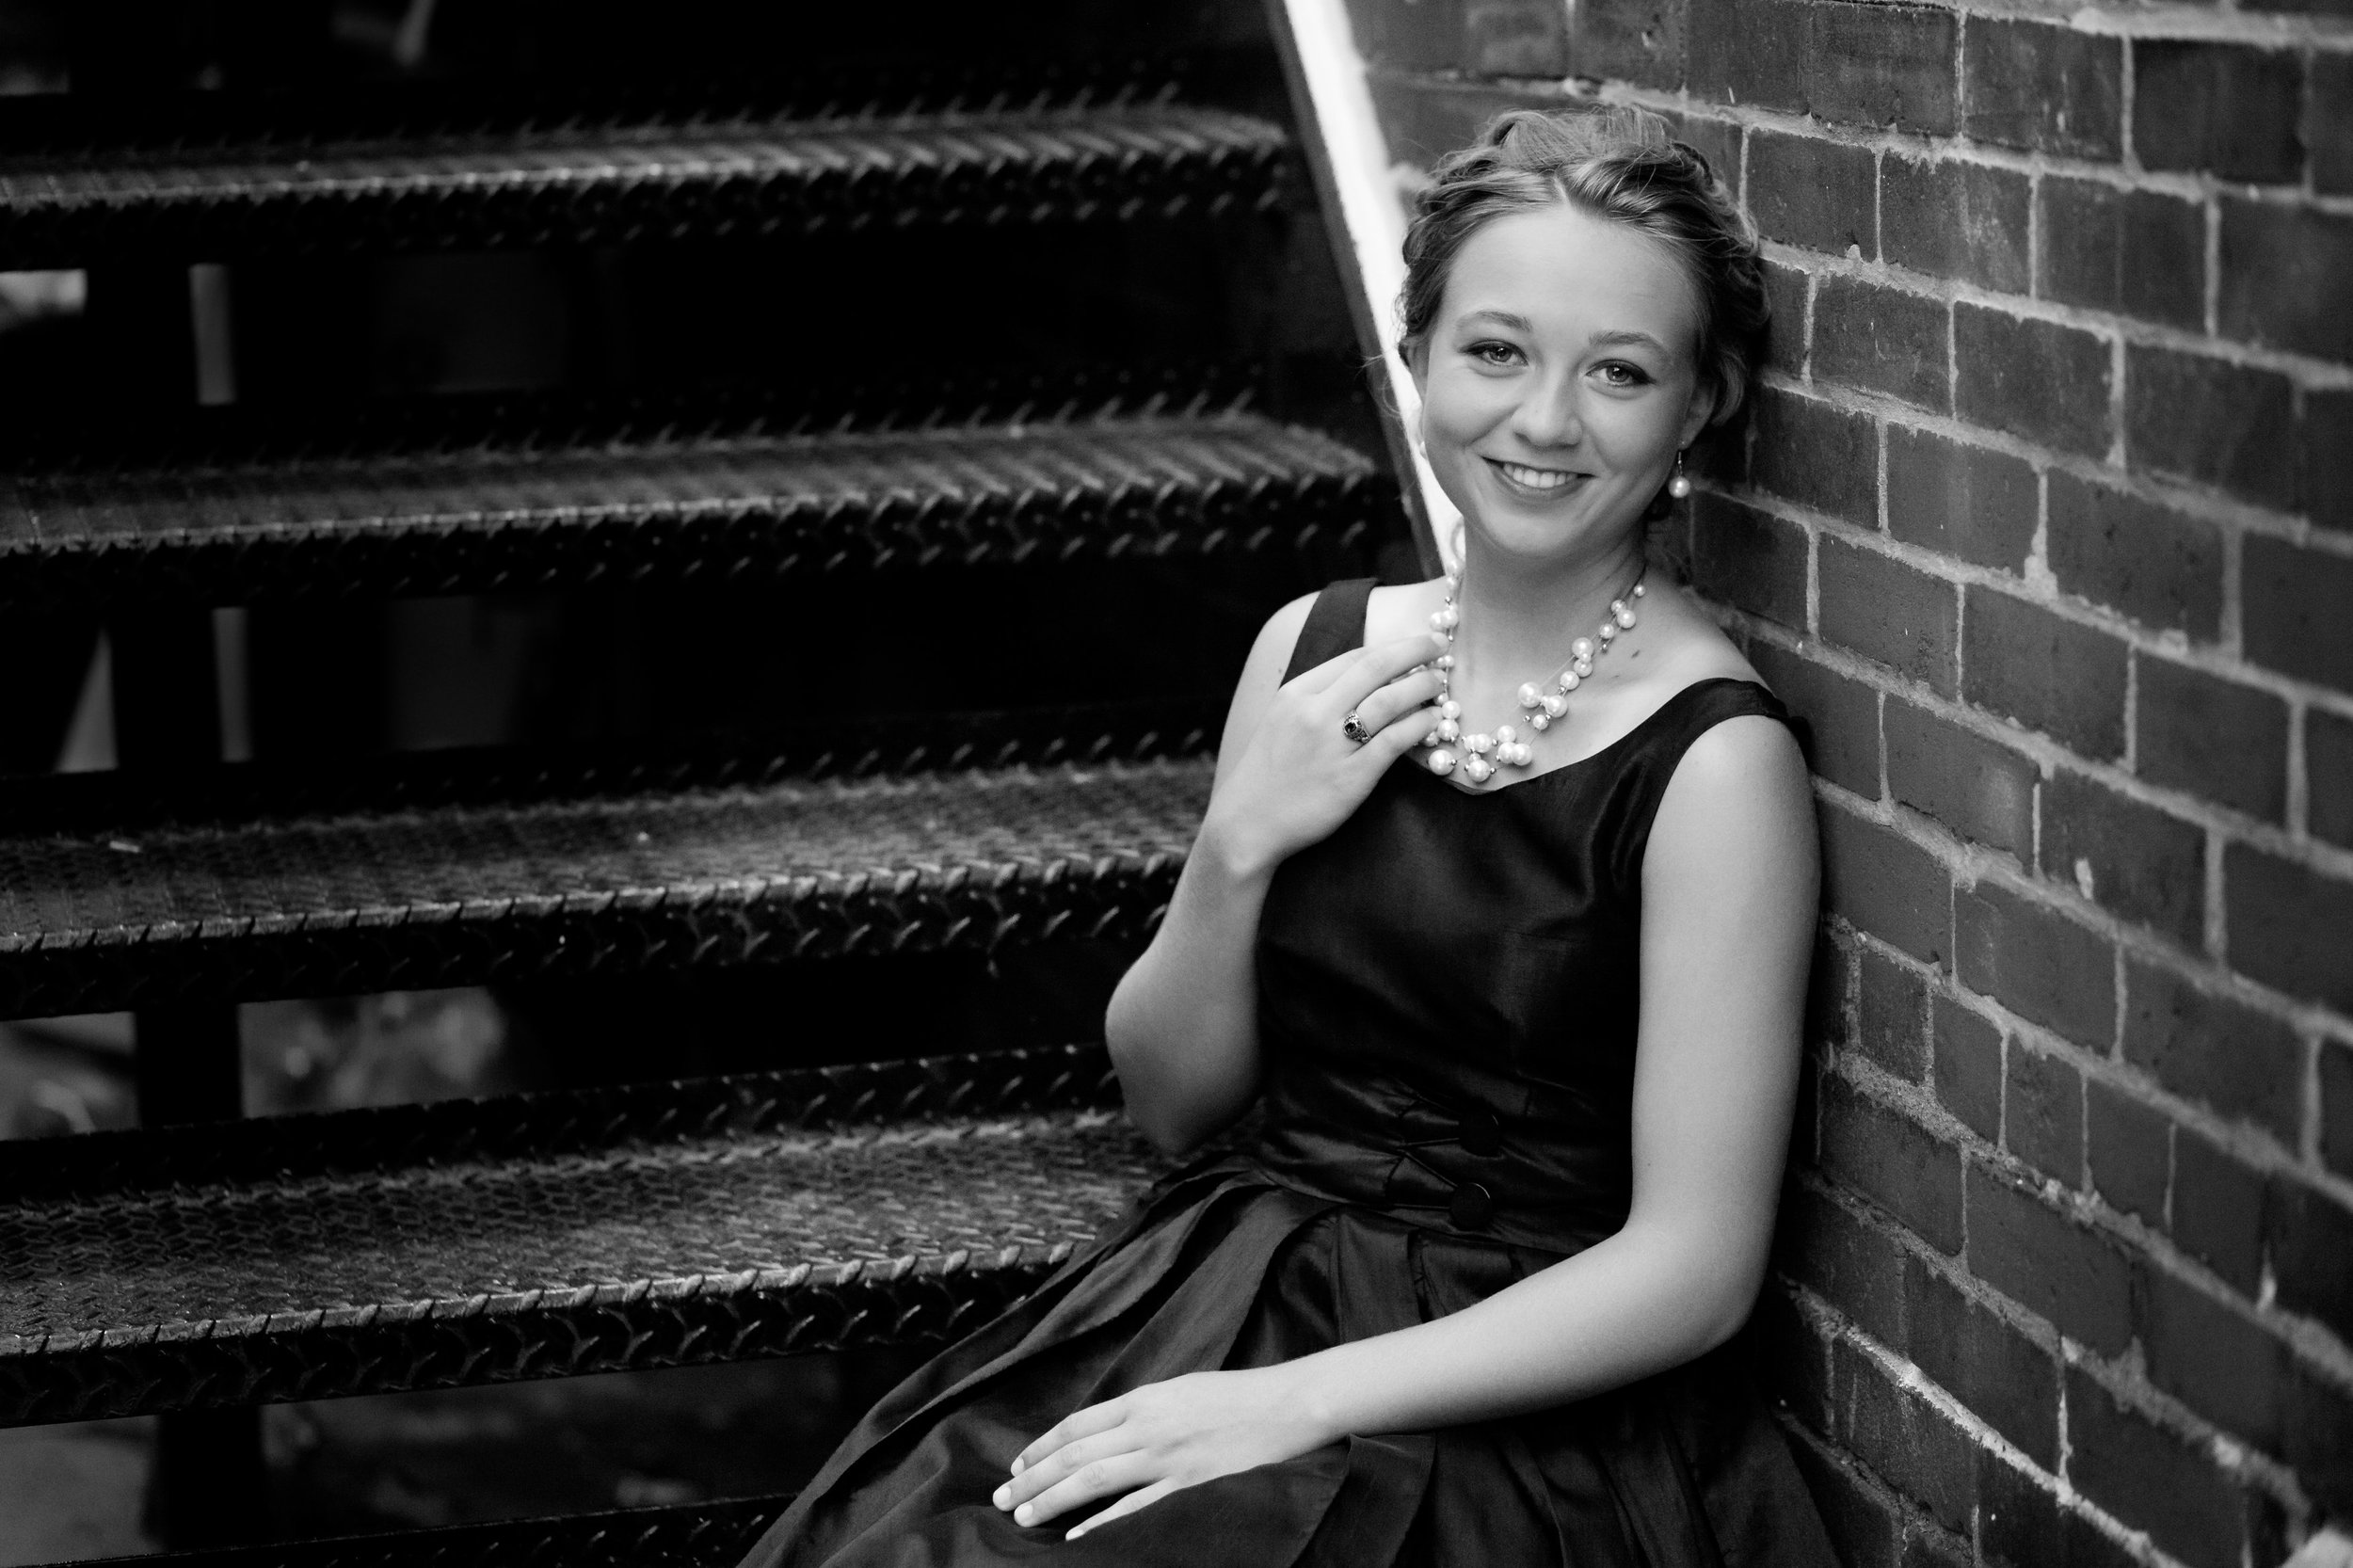 Elise Seeley 2014-Elise Seeley 2014-0088.jpg